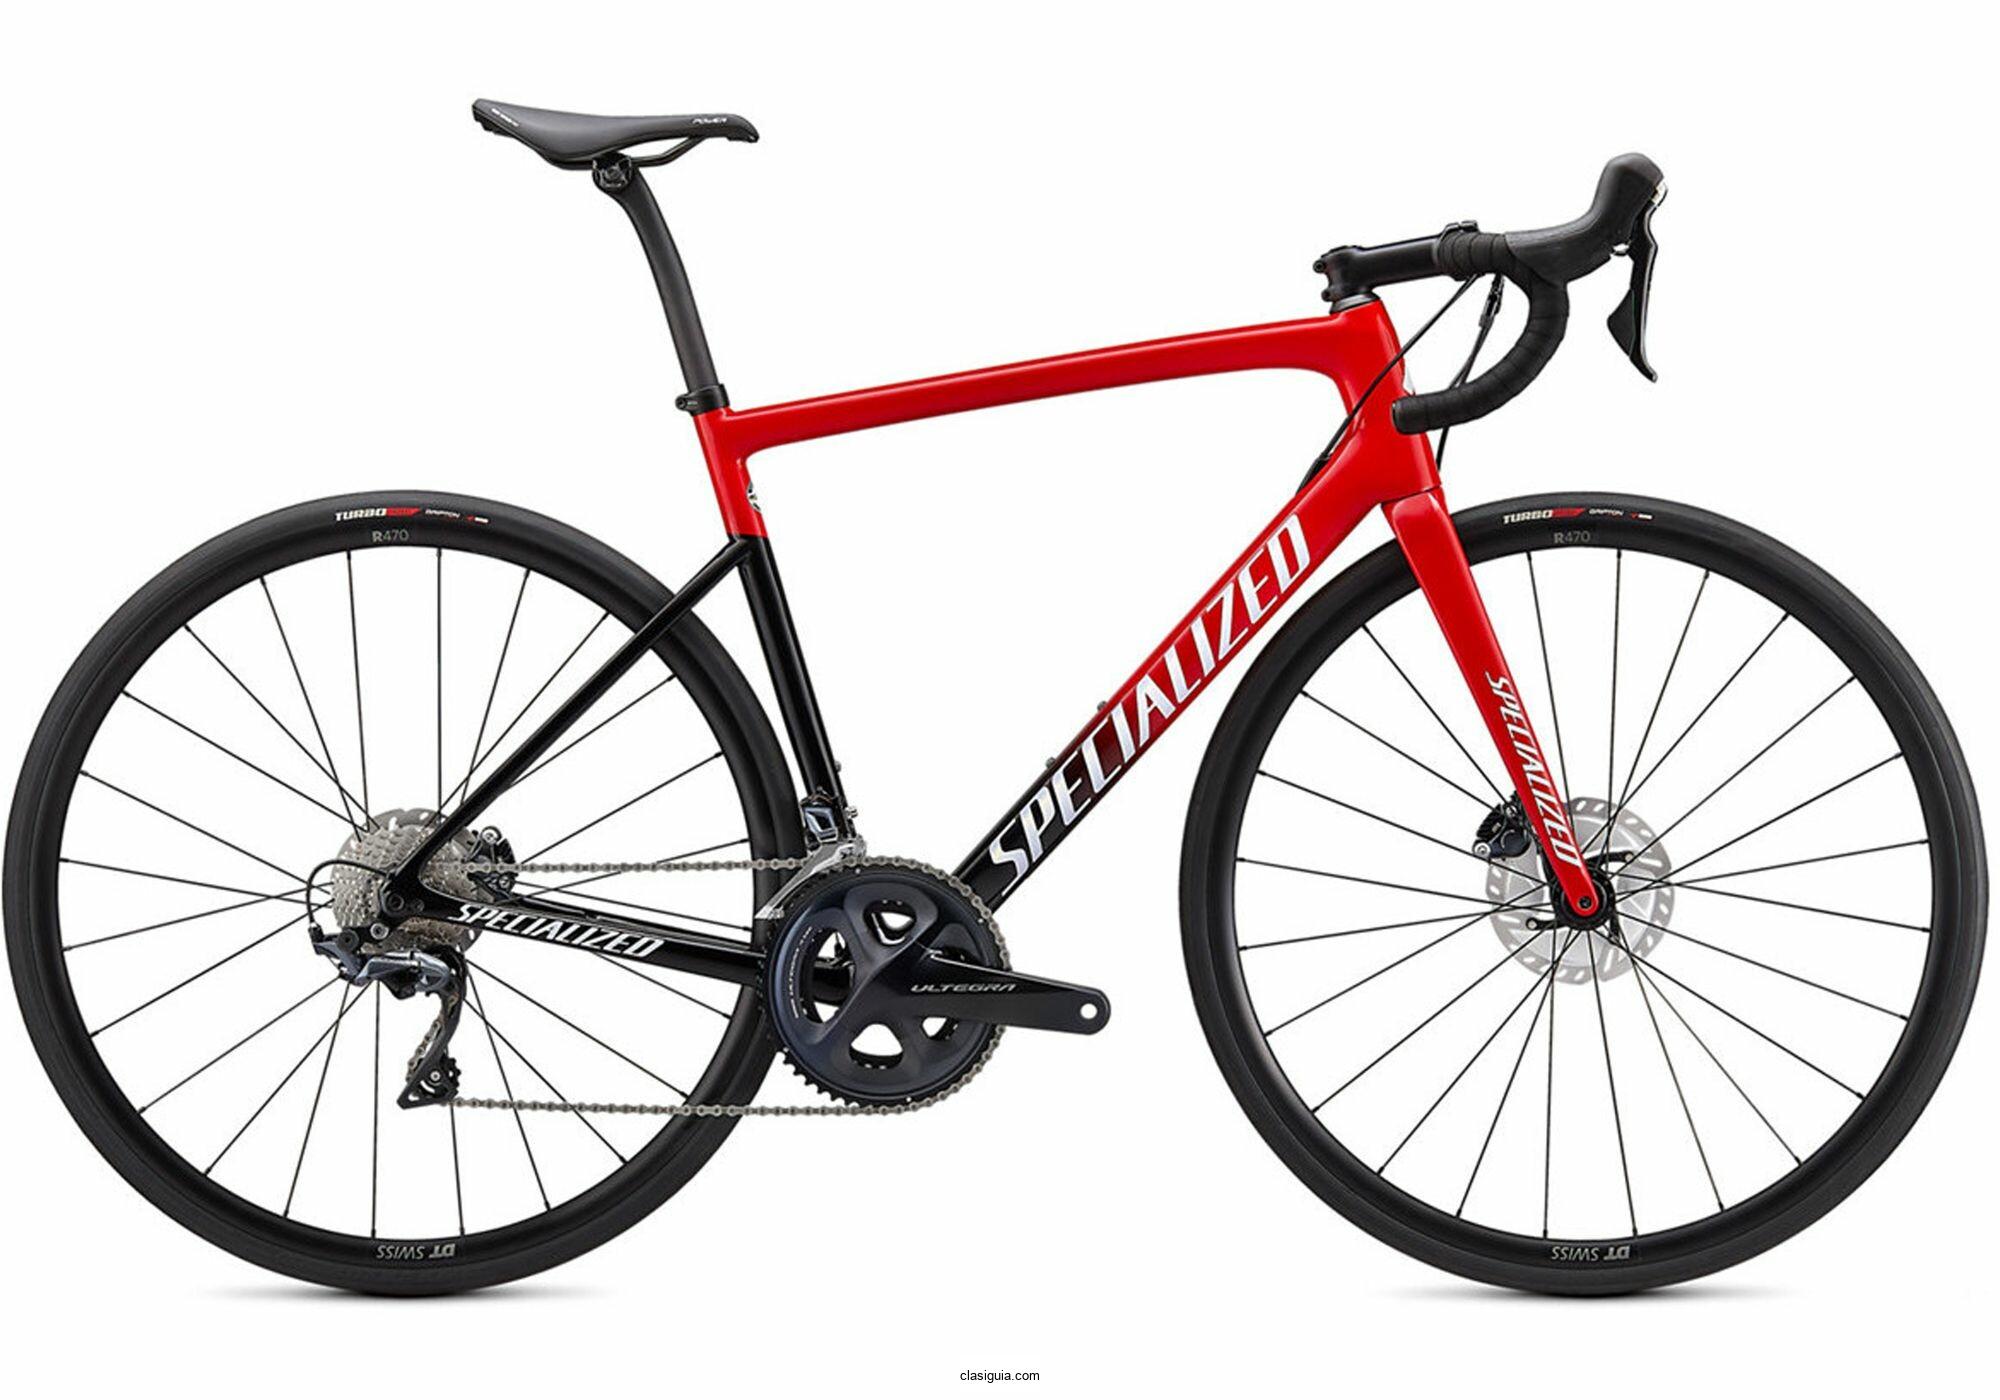 2021 - Specialized Road Bike TARMAC SL6 COMP Ultegra (RUNCYCLES)